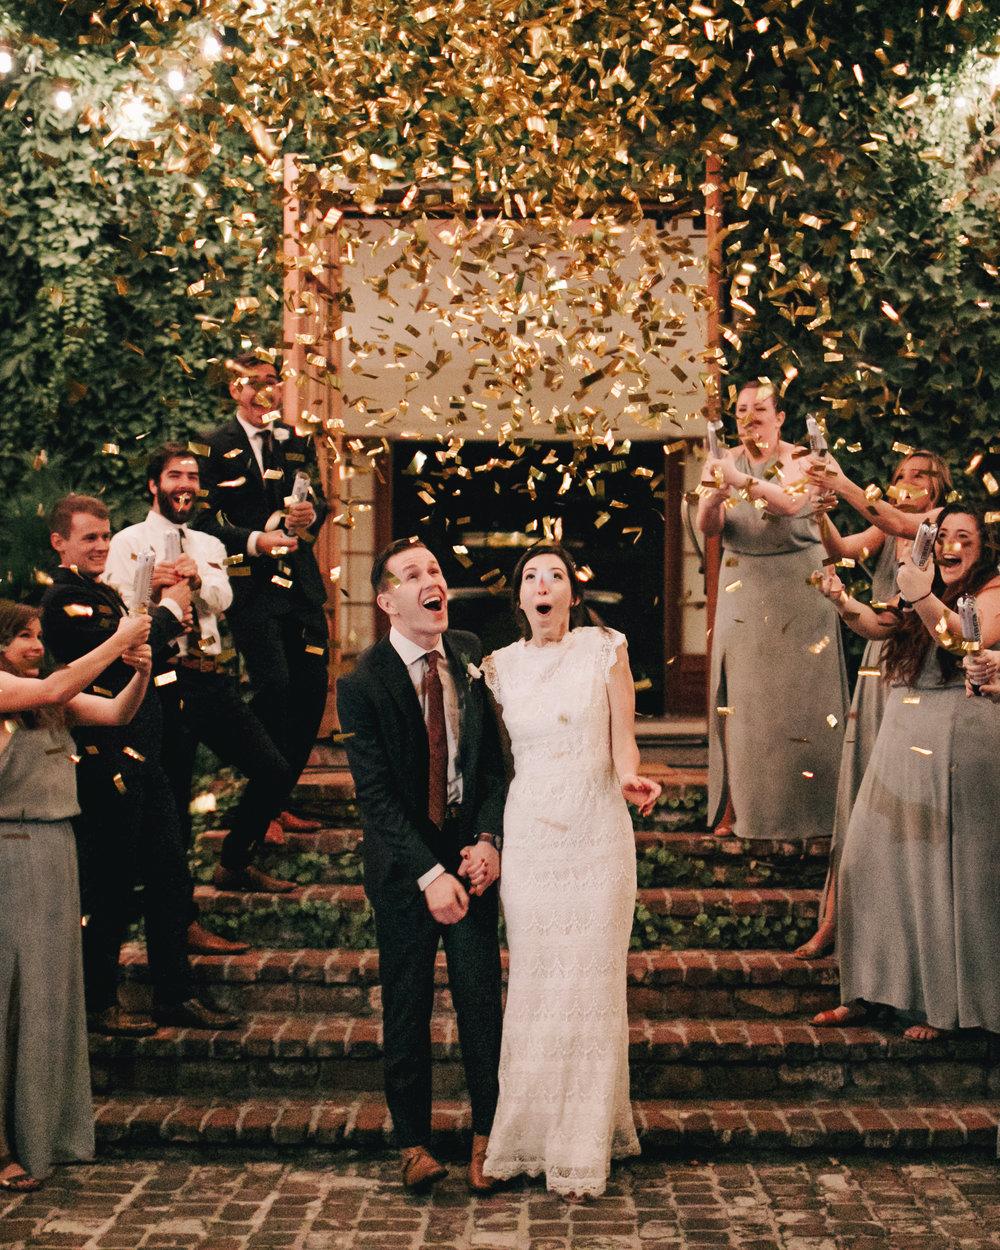 Gold Confetti Exit Wedding Reception Atlanta Summerour Studio Photographer Photography Anthology Daughters of Simone The Sentimentalist